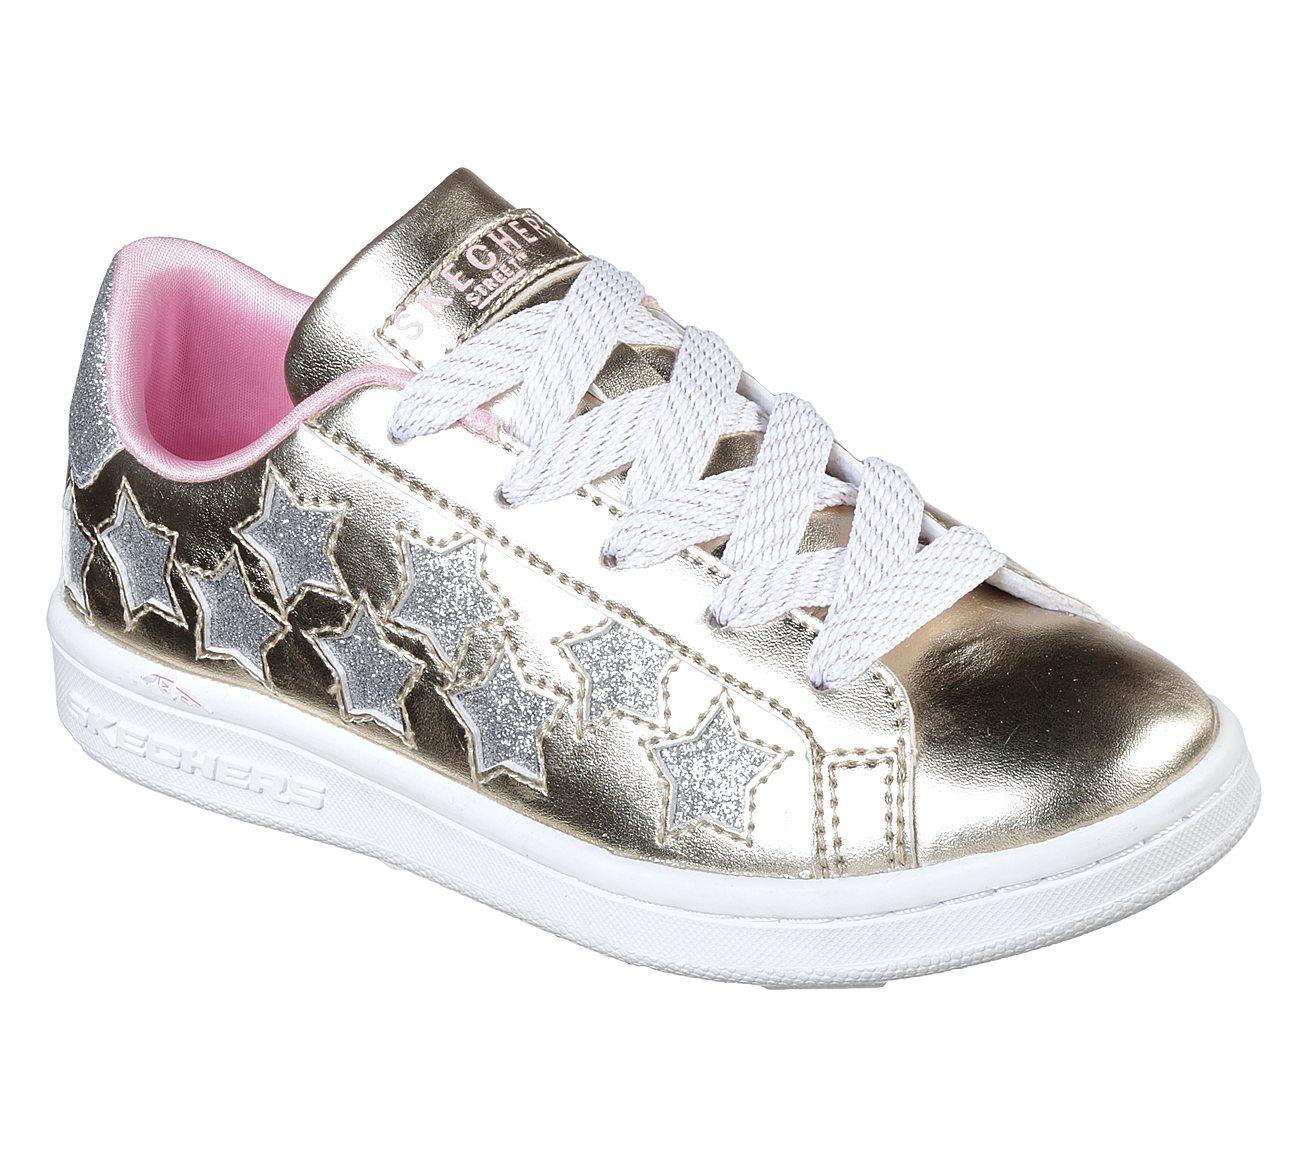 Buy SKECHERS Omne Lil Star Side SKECHER Street Shoes skpuT